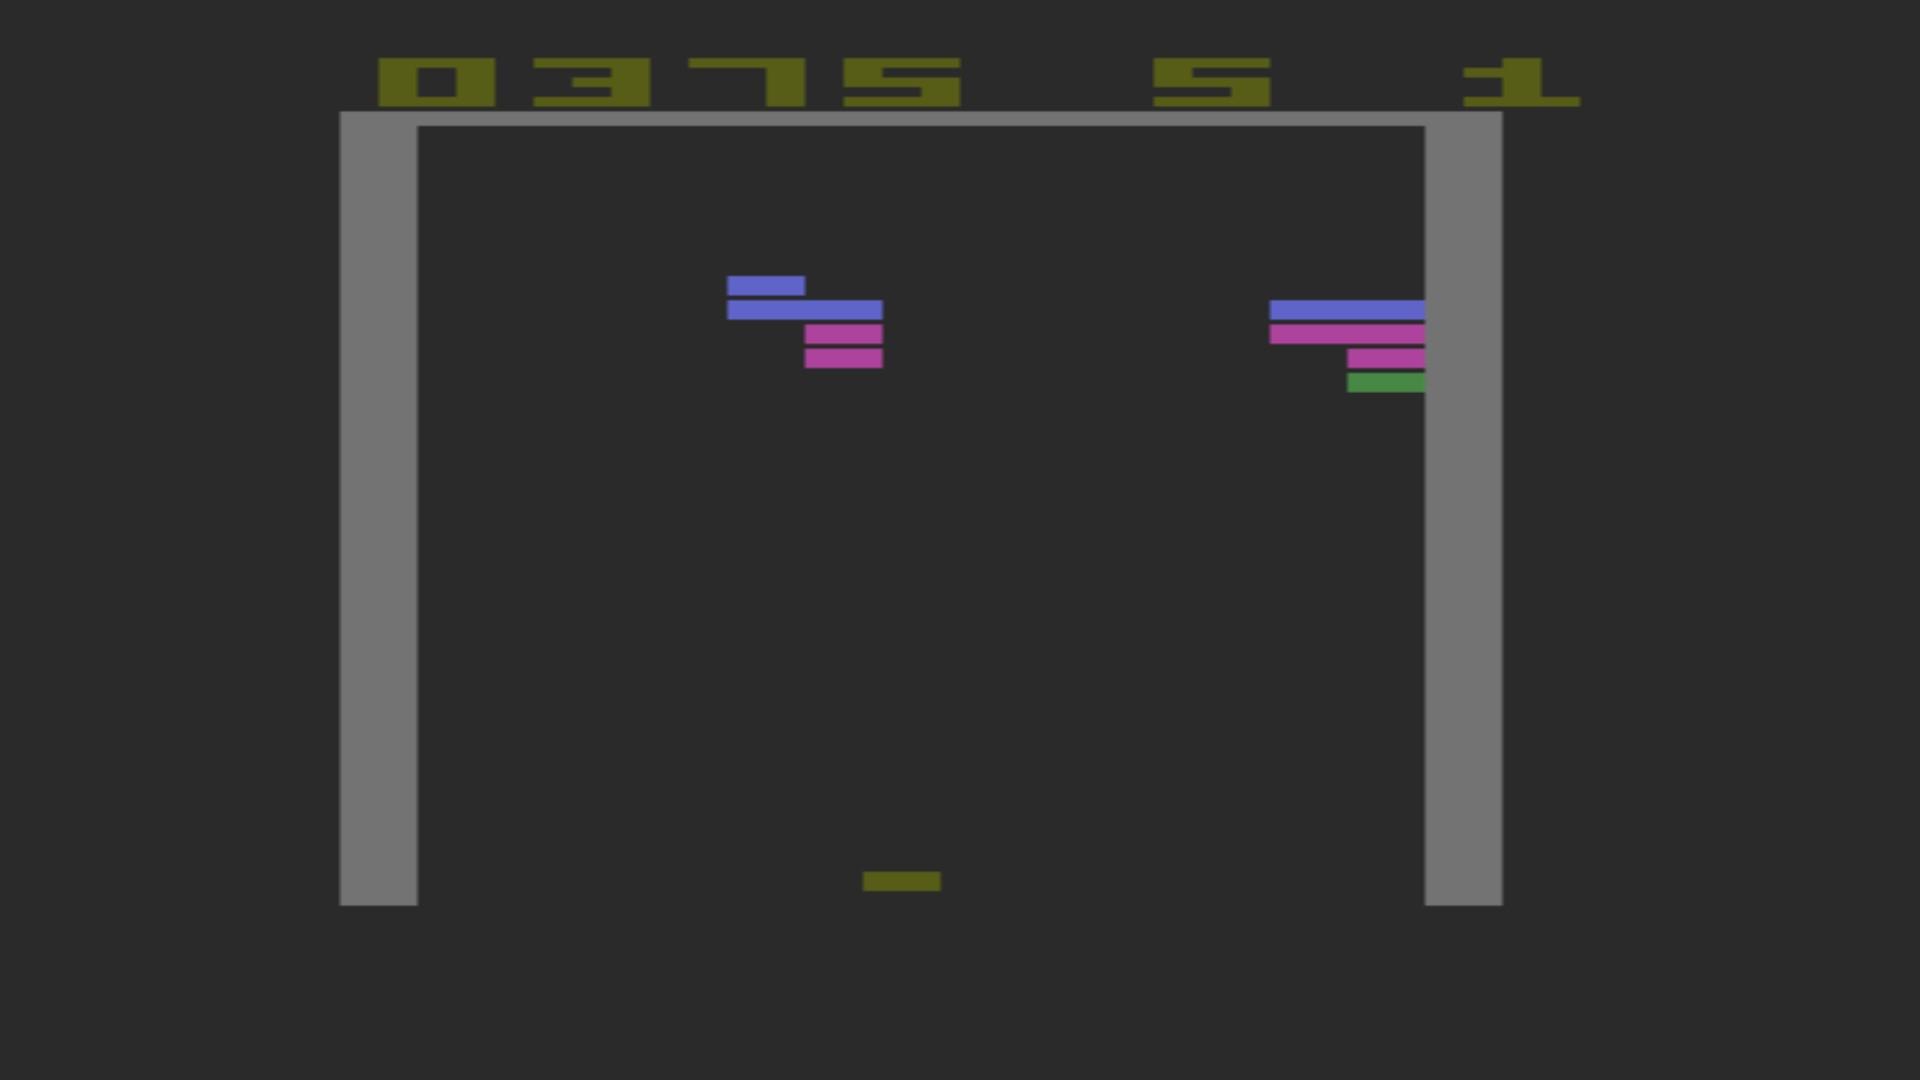 AkinNahtanoj: Super Breakout (Atari 2600 Emulated Novice/B Mode) 375 points on 2020-10-17 09:37:40